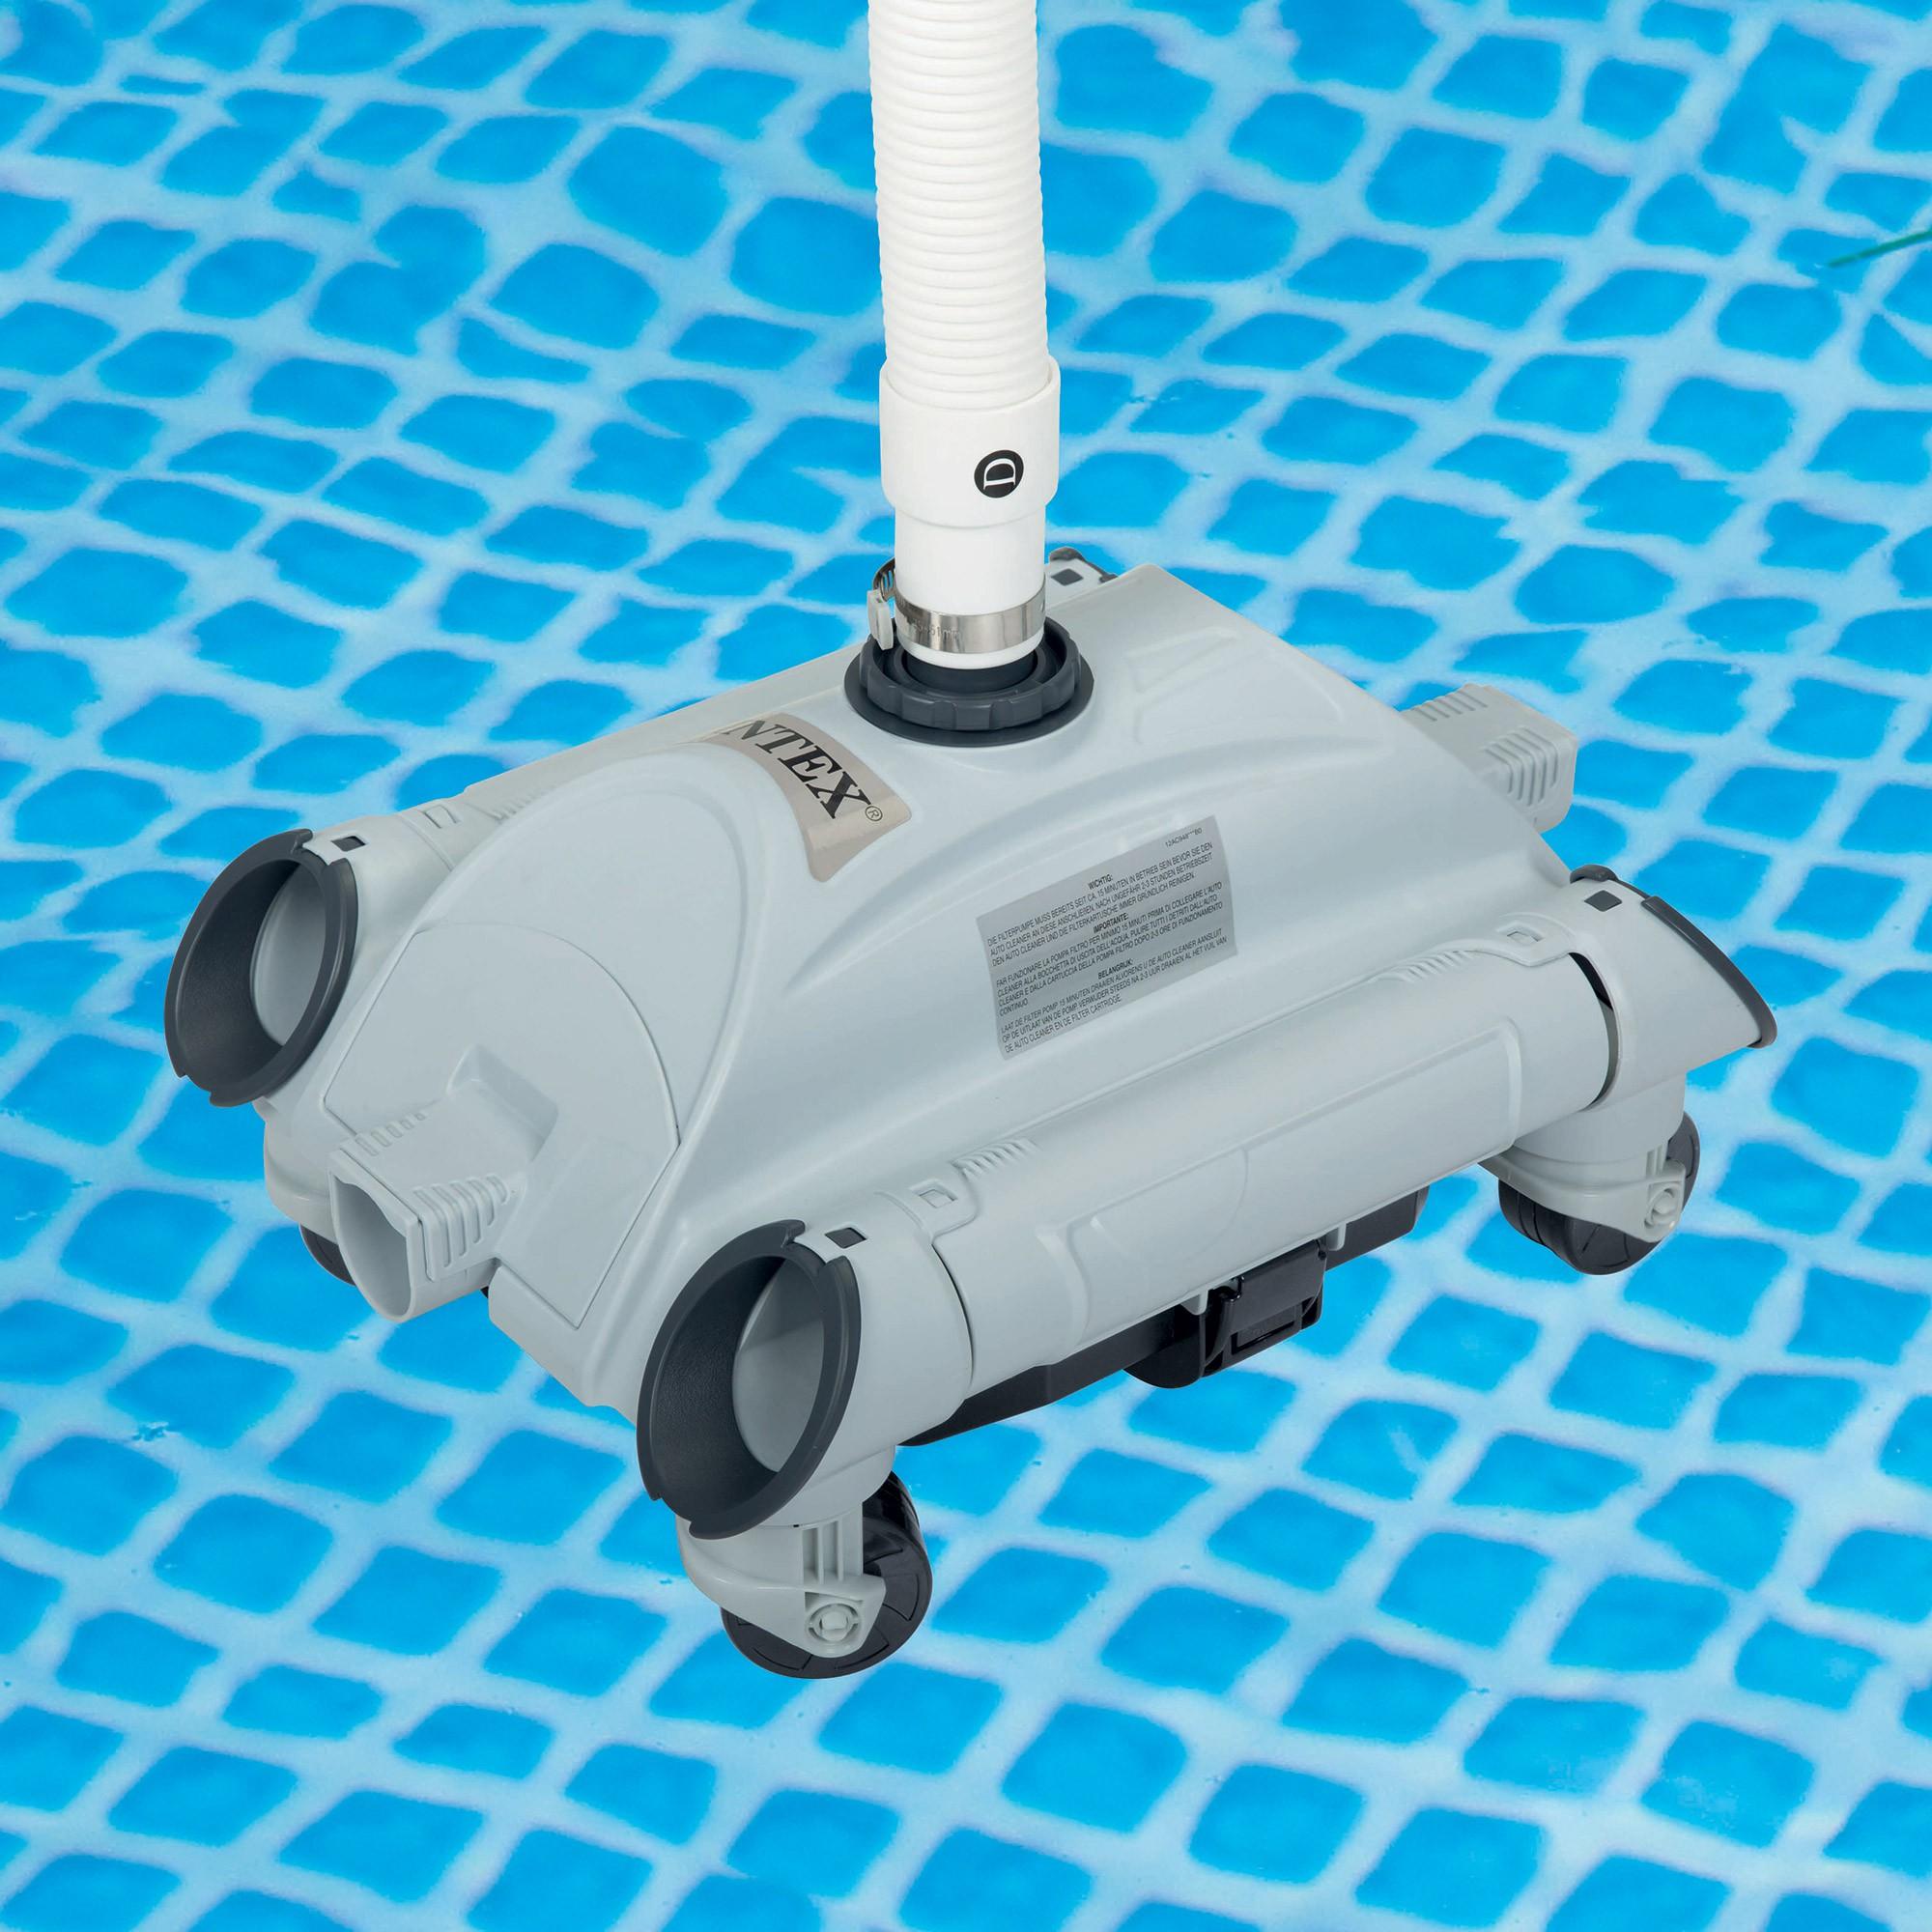 aspirateur piscine intex notice. Black Bedroom Furniture Sets. Home Design Ideas